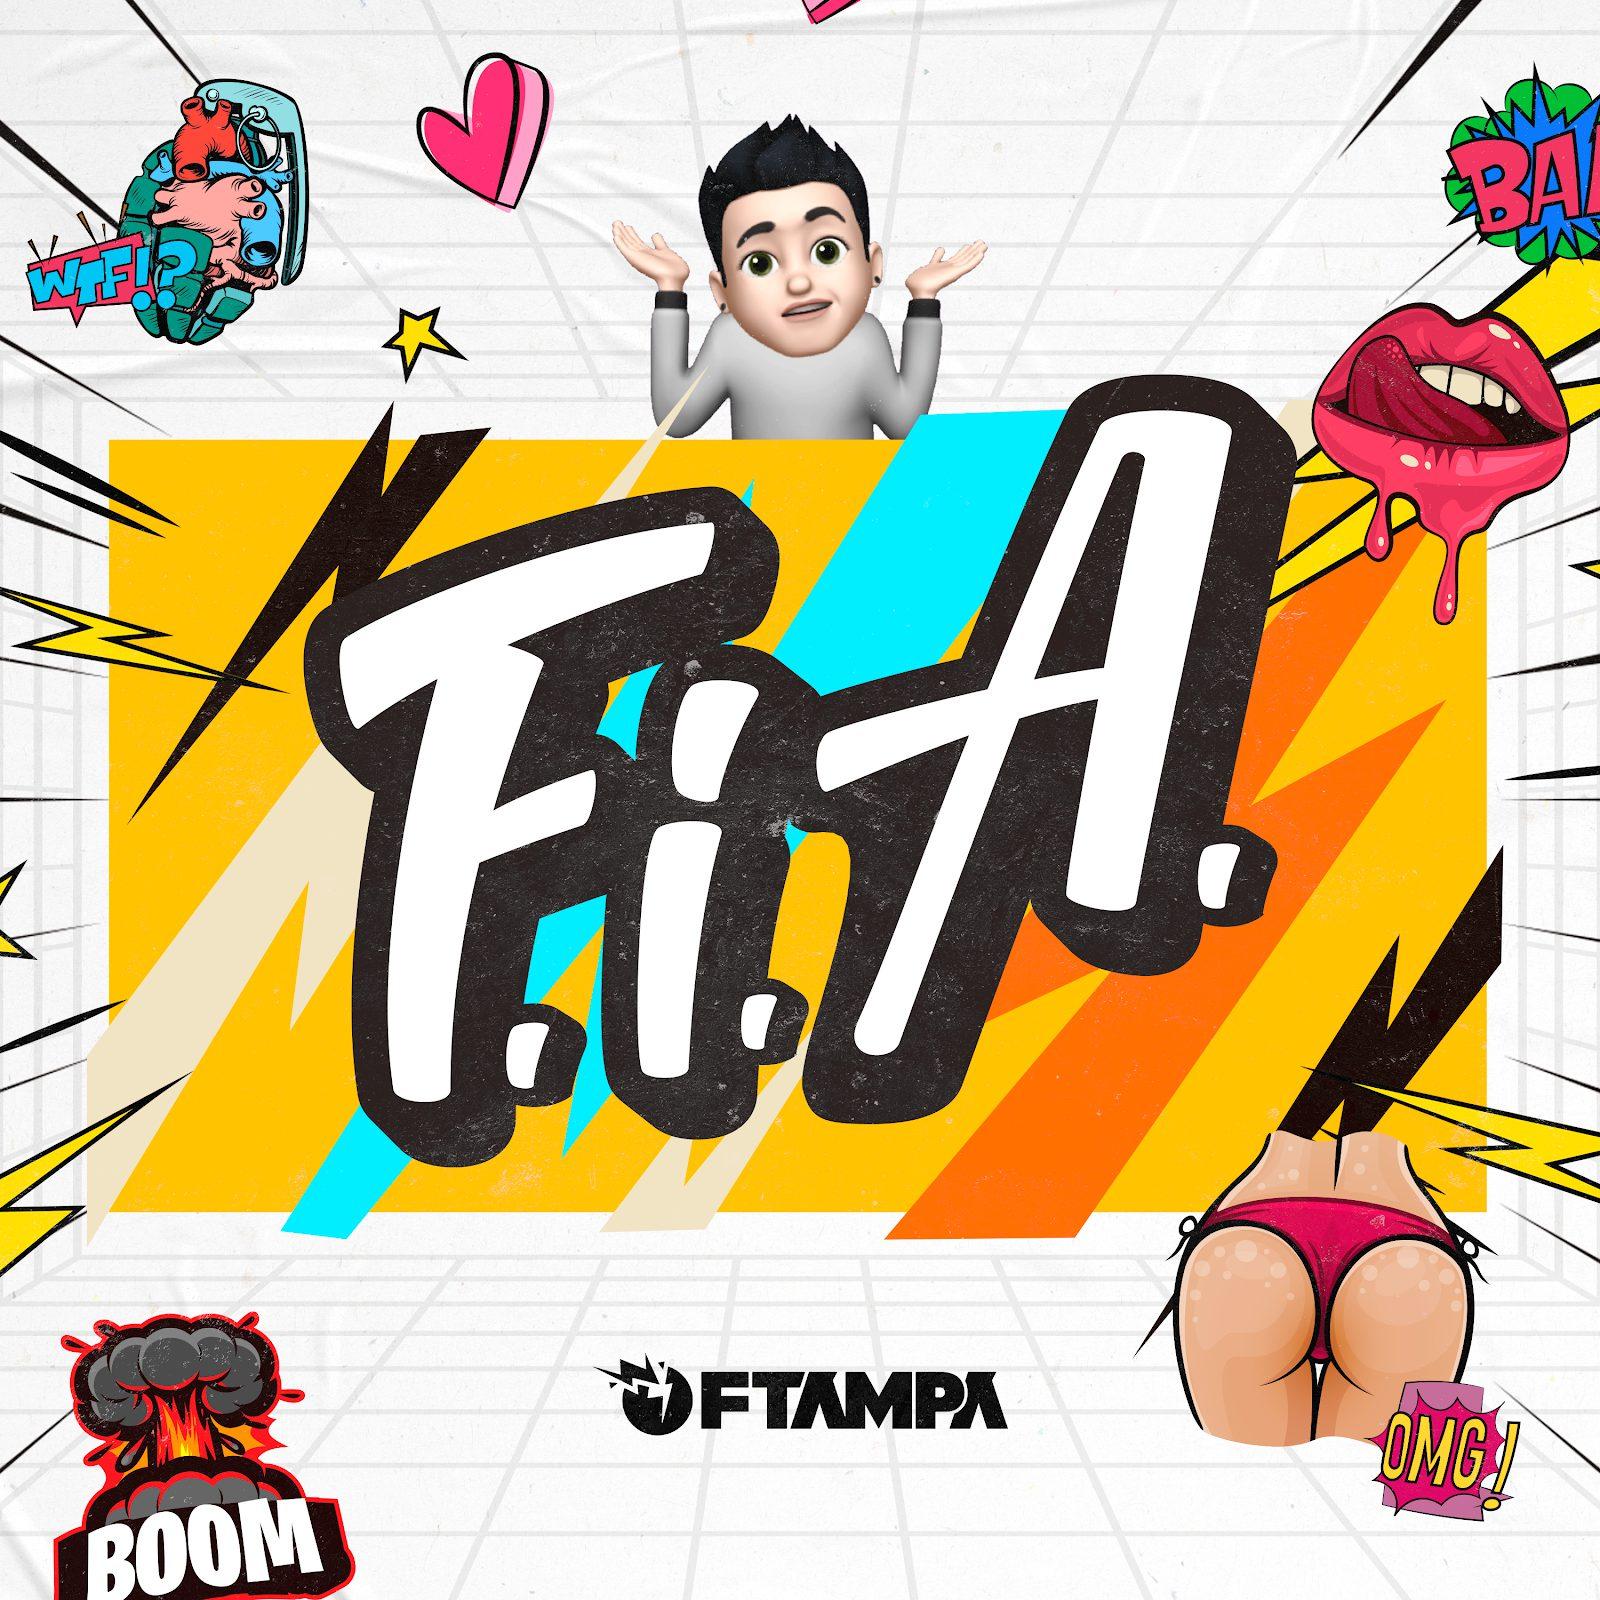 FTampa- FIA